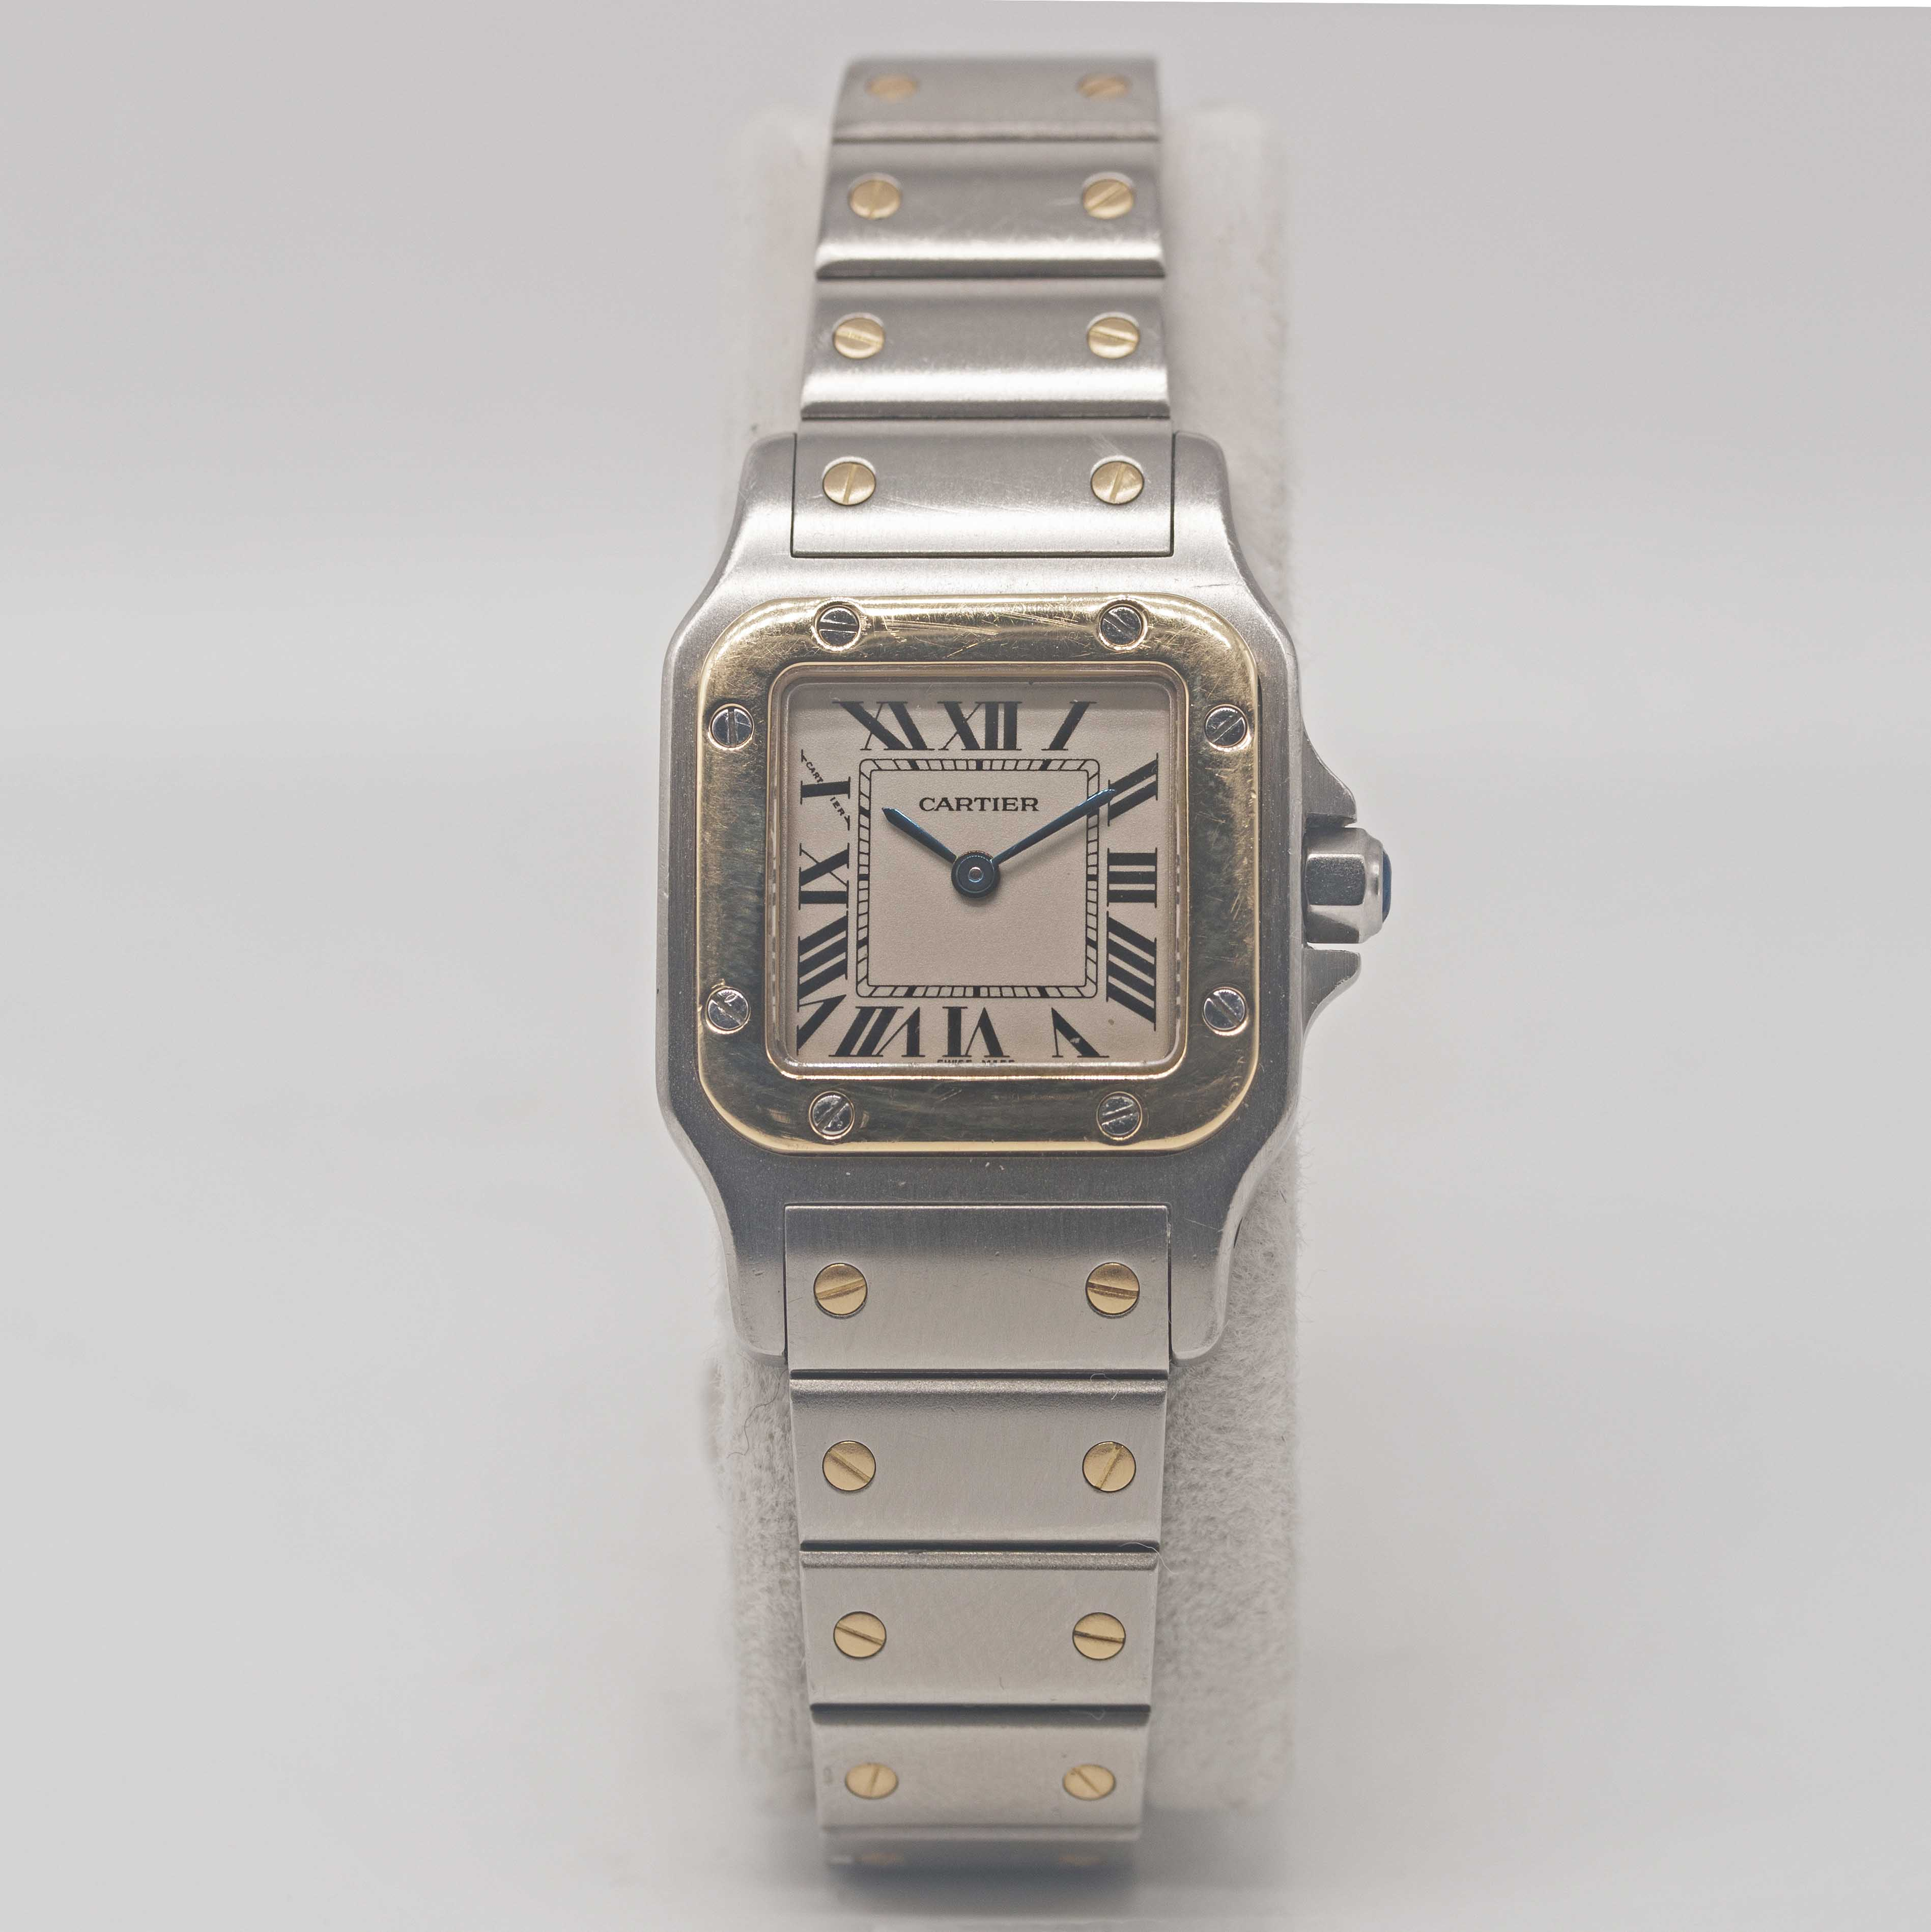 Lot 6 - A LADIES STEEL & GOLD CARTIER SANTOS GALBEE BRACELETWATCH CIRCA 1990s, REF. 1567 Movement: